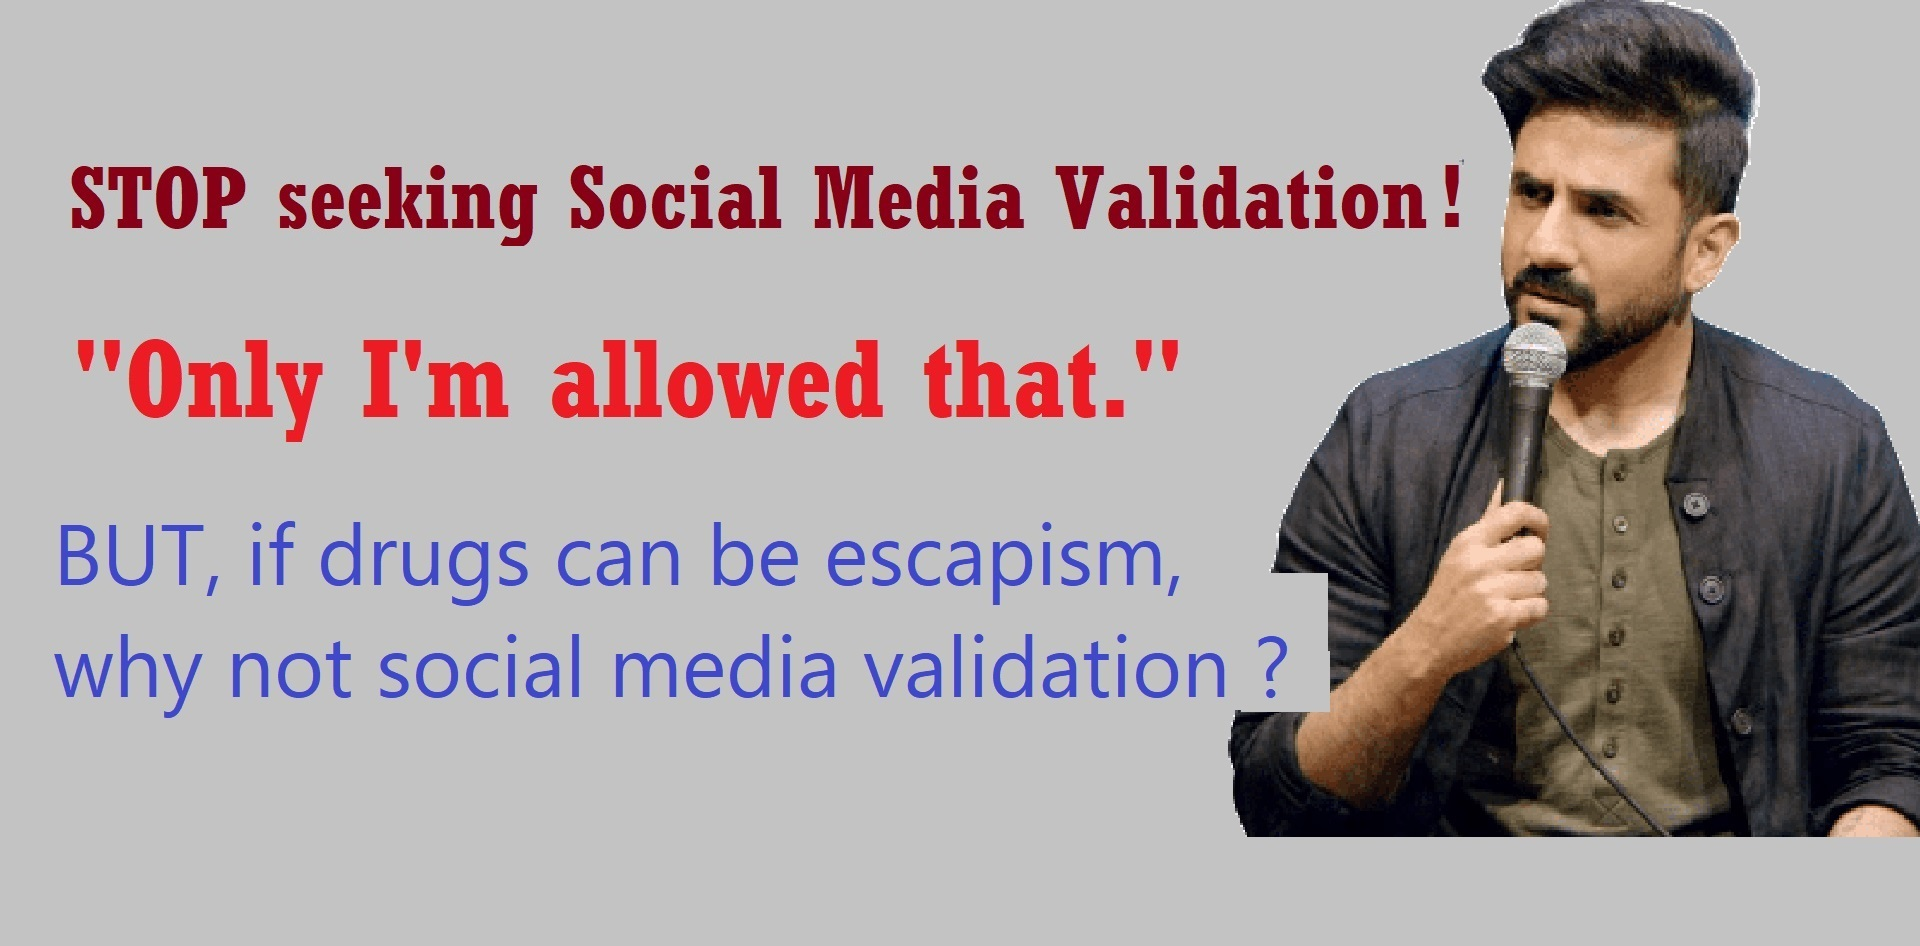 Is Seeking Social Media Validation Just for Losers?